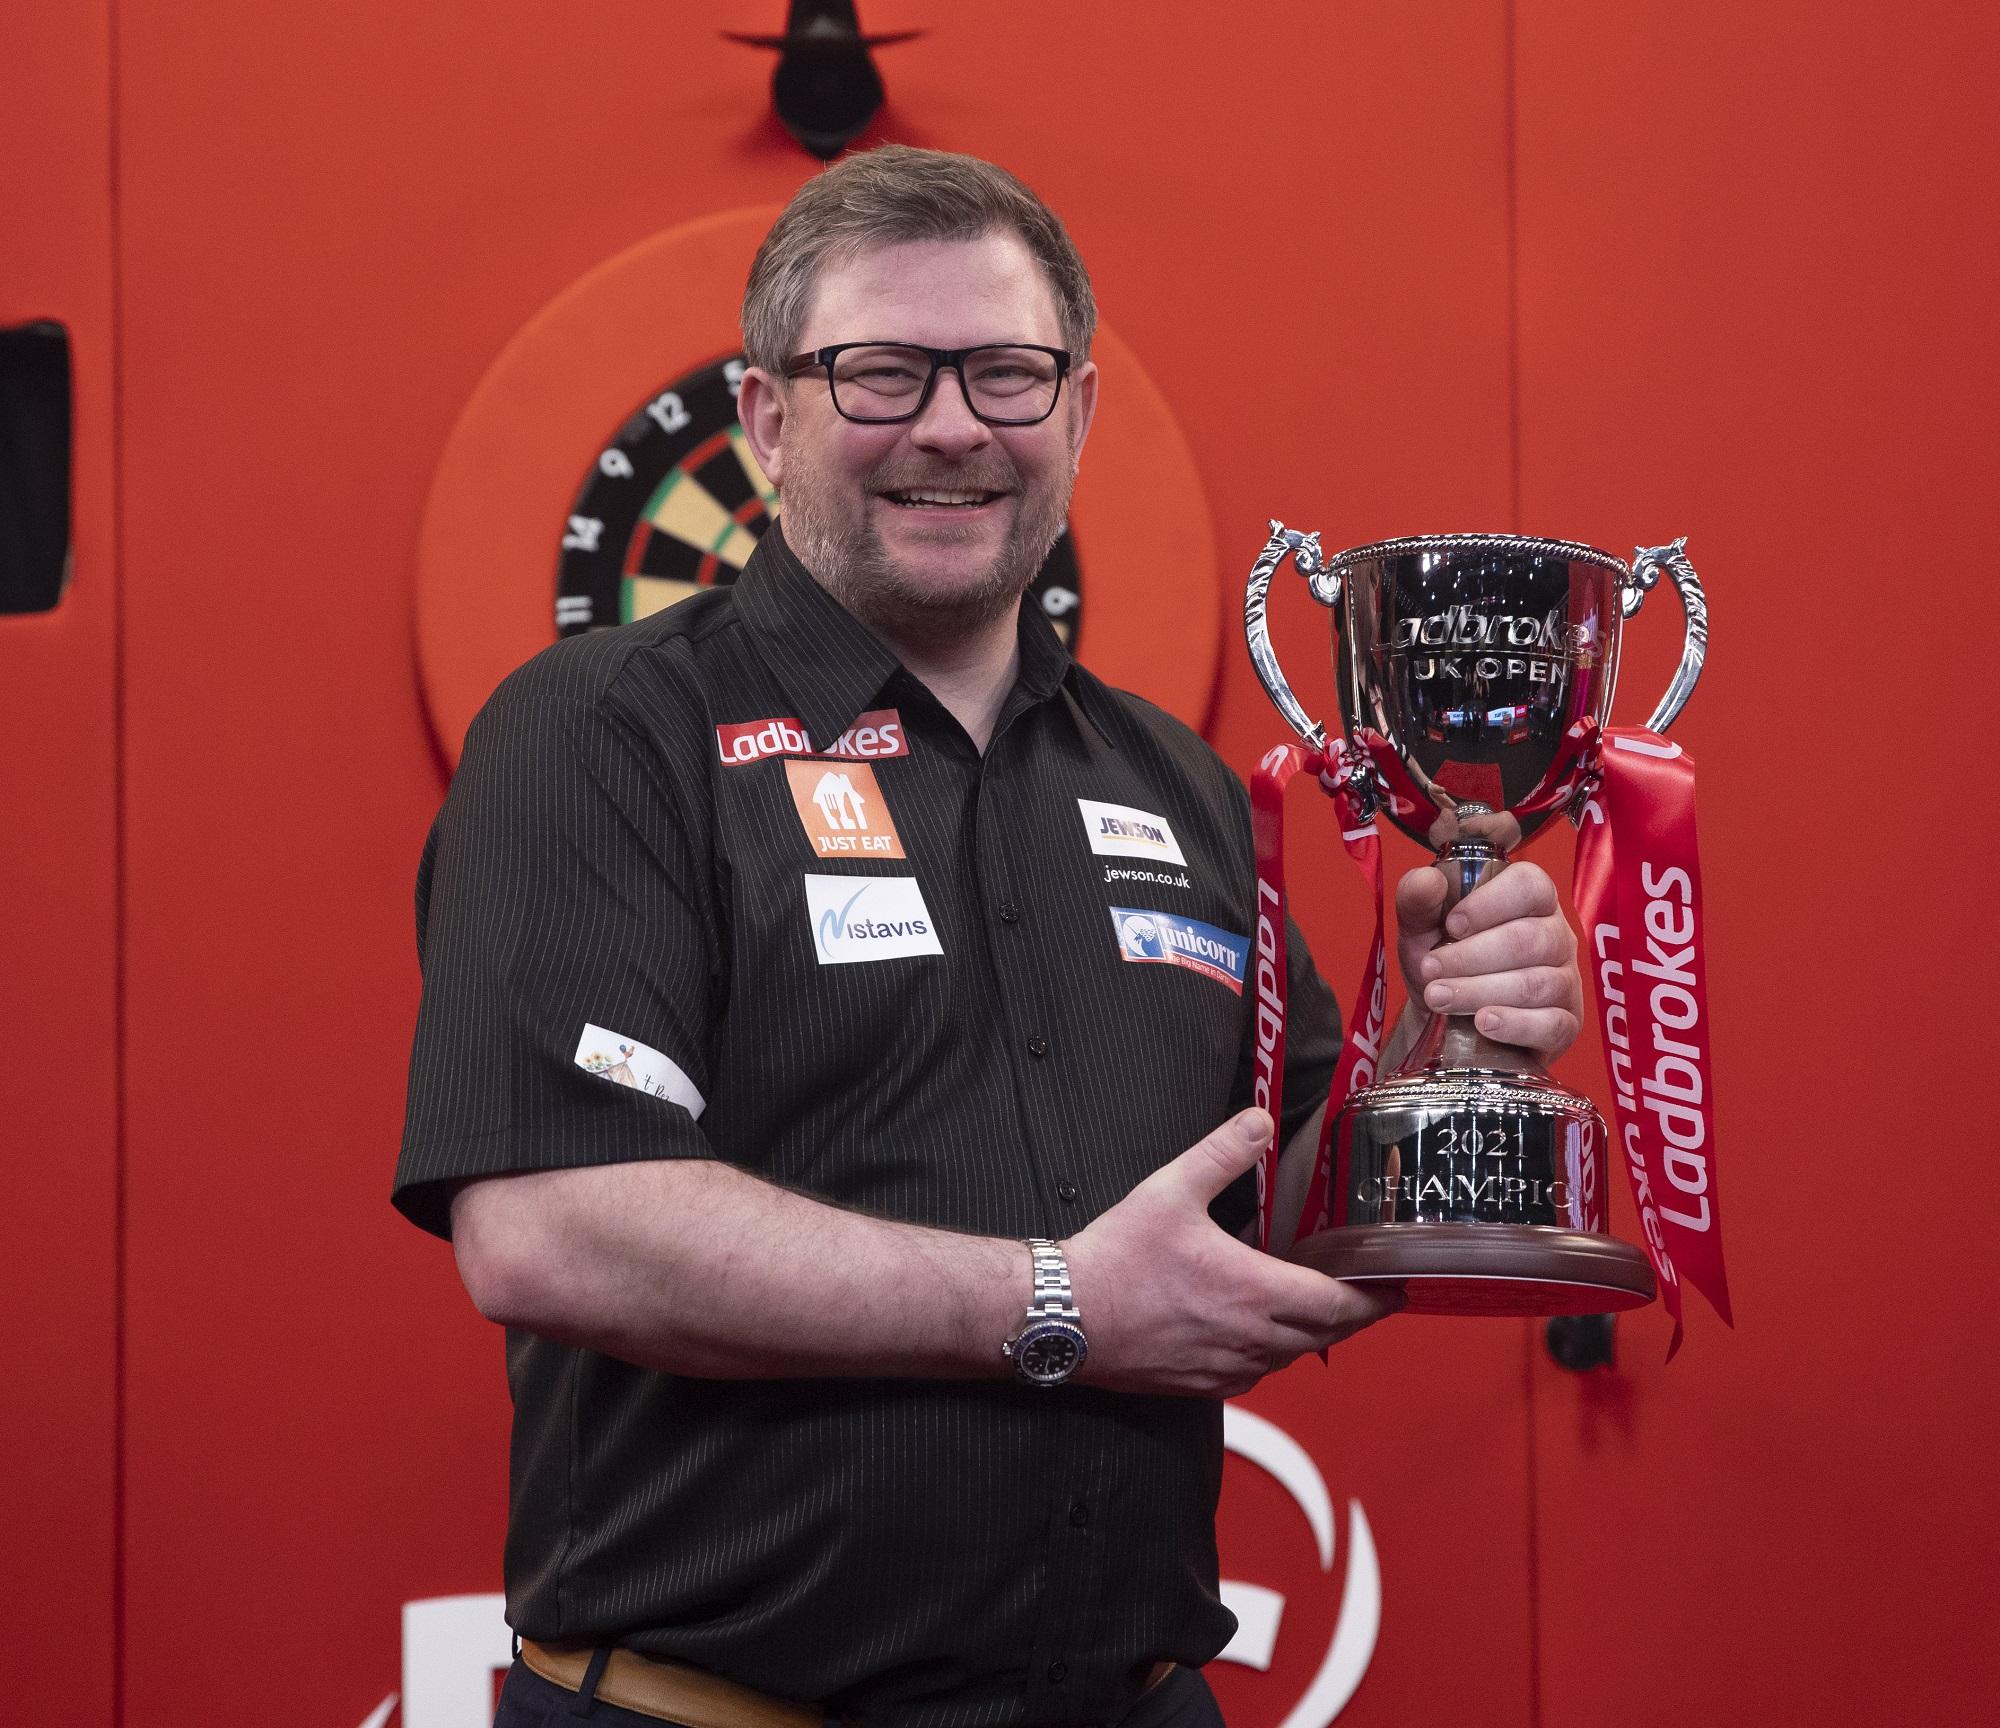 Wonderful Wade crowned UK Open Champion!